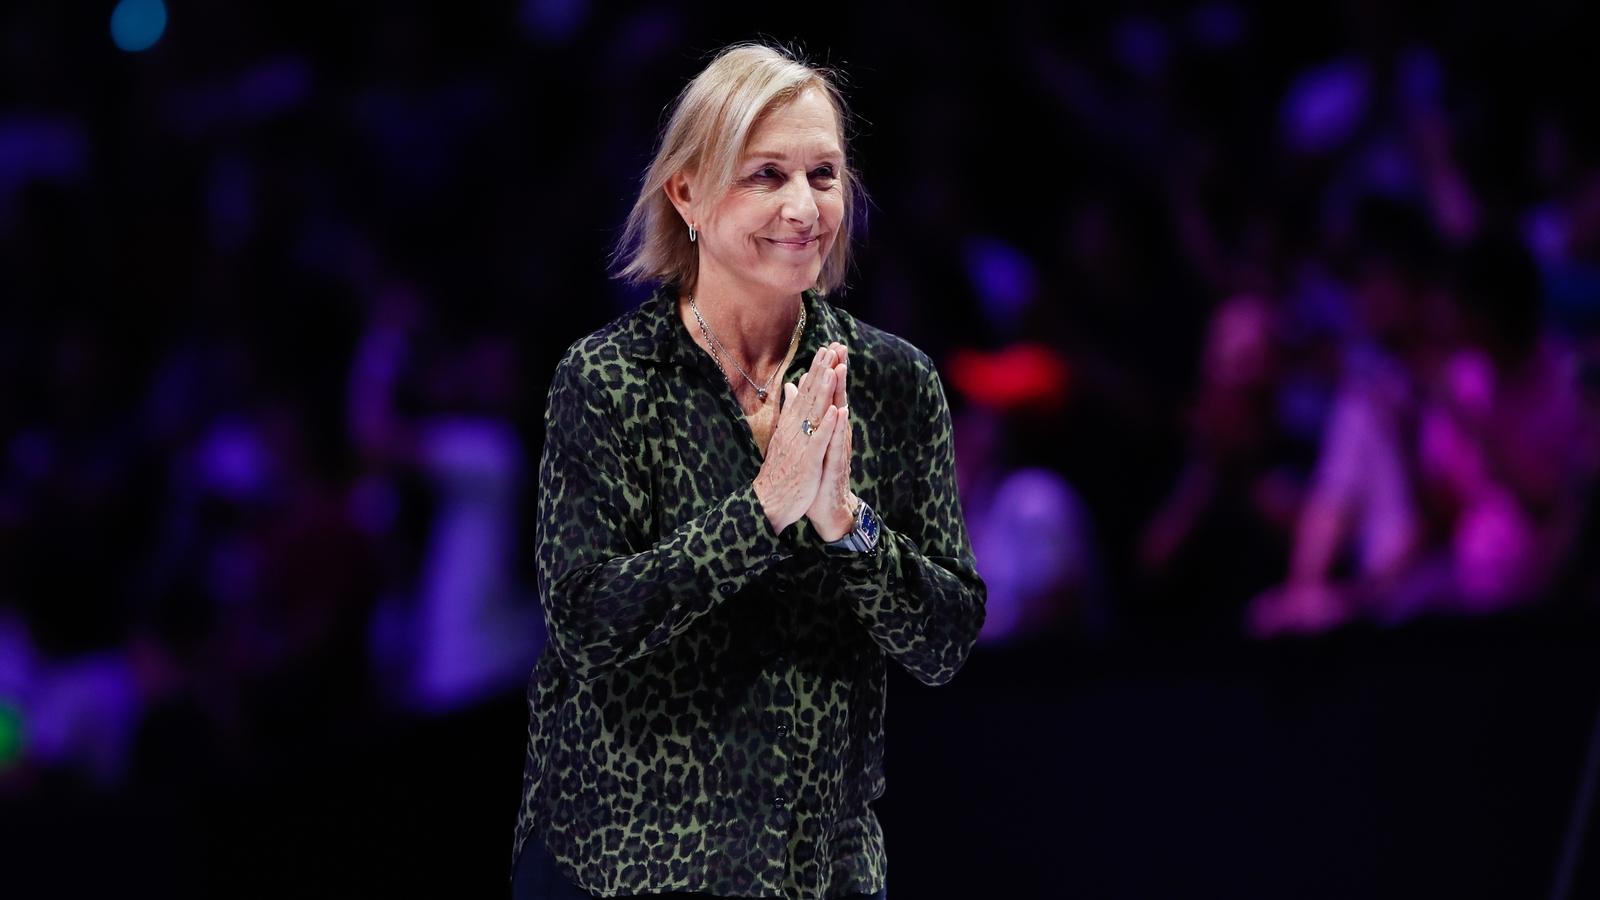 Martina Navratilova: 'Being silent isn't acceptable'